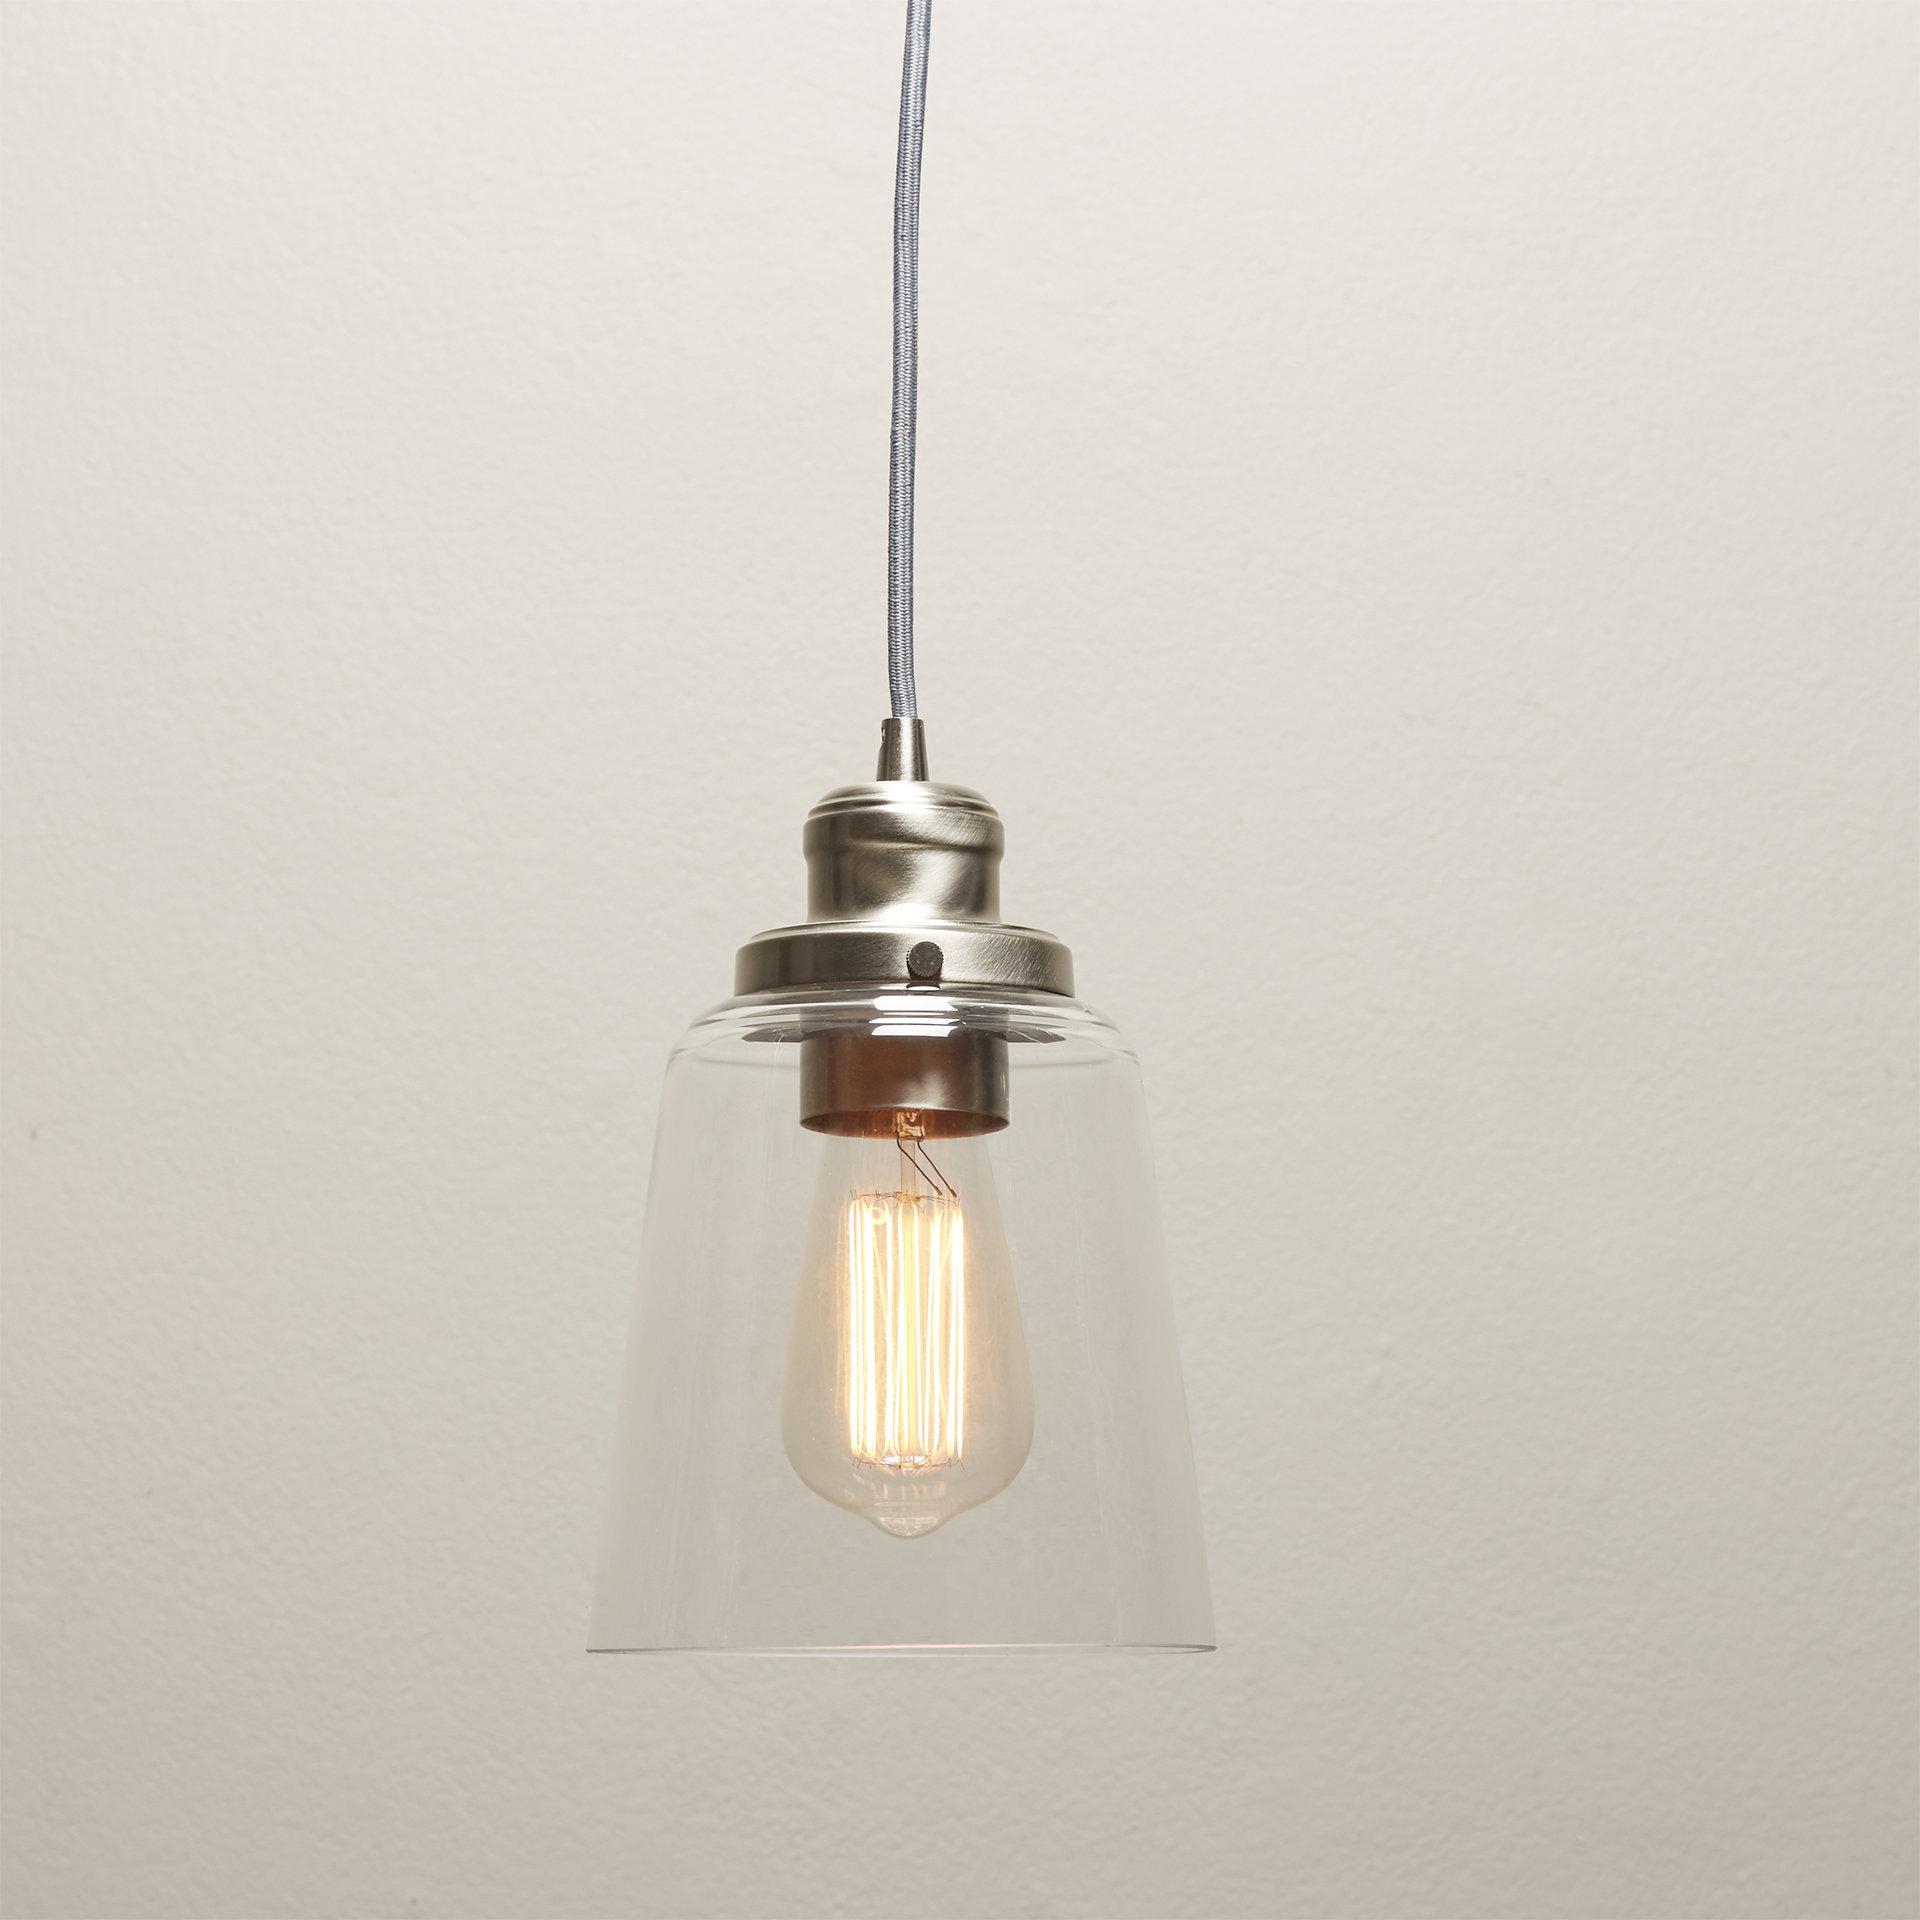 Most Popular Roslindale 1 Light Single Bell Pendants Within 1 Light Single Bell Pendant (View 8 of 20)